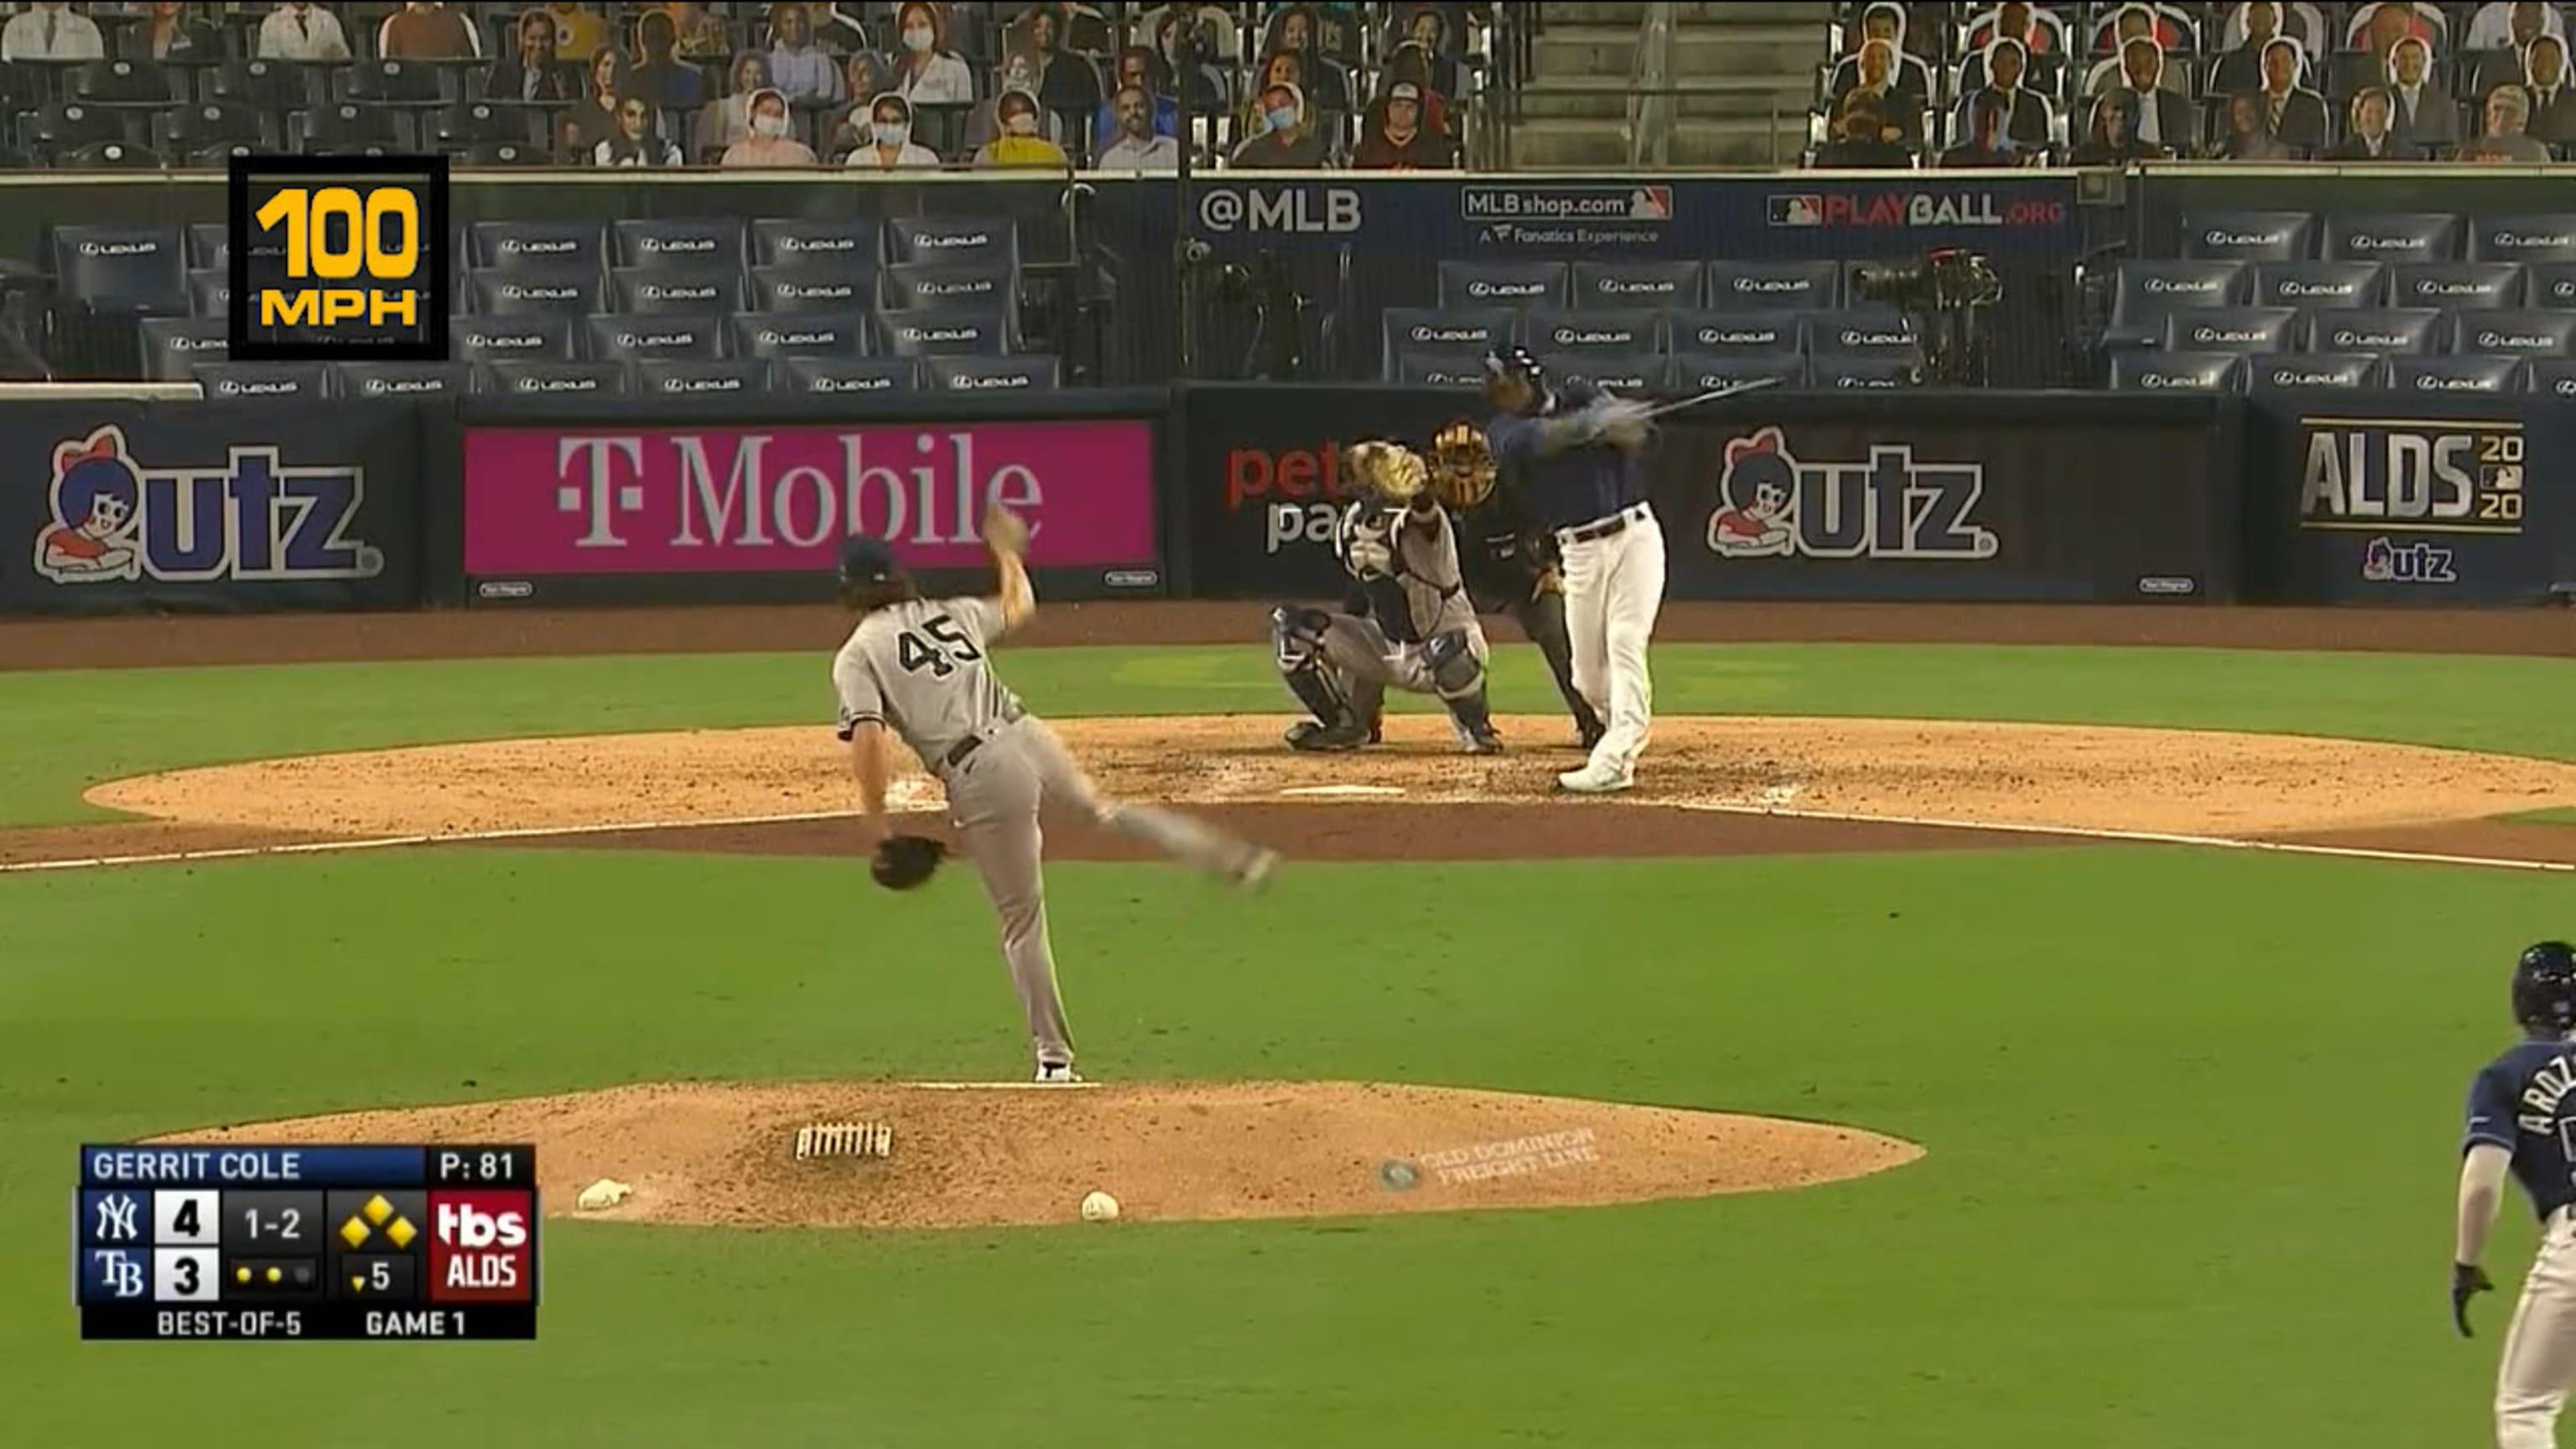 MLB Tonight breaks down Cole